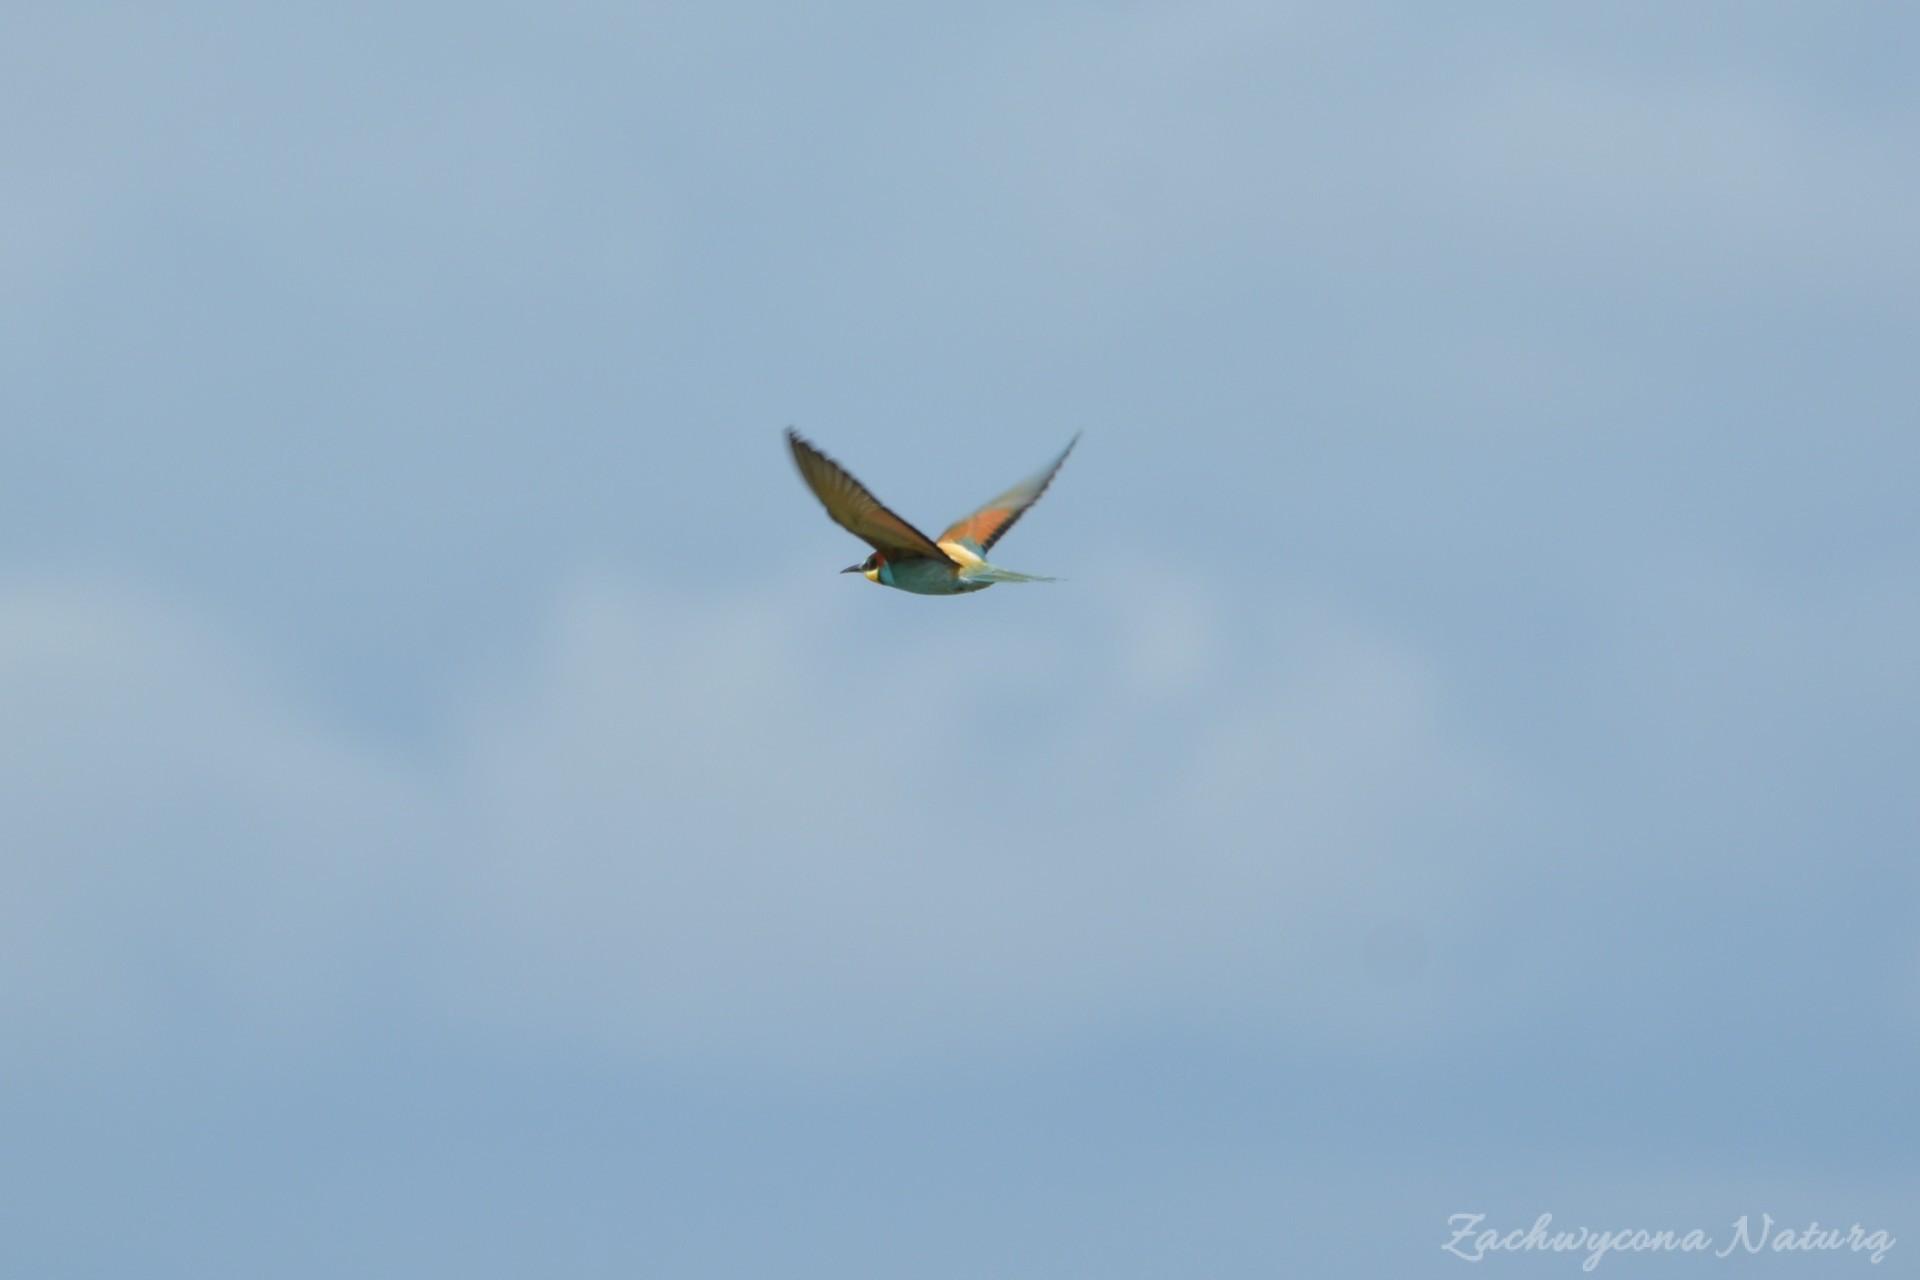 zolna-kolorowa-jak-papuga-merops-apiaster-bee-eater-8